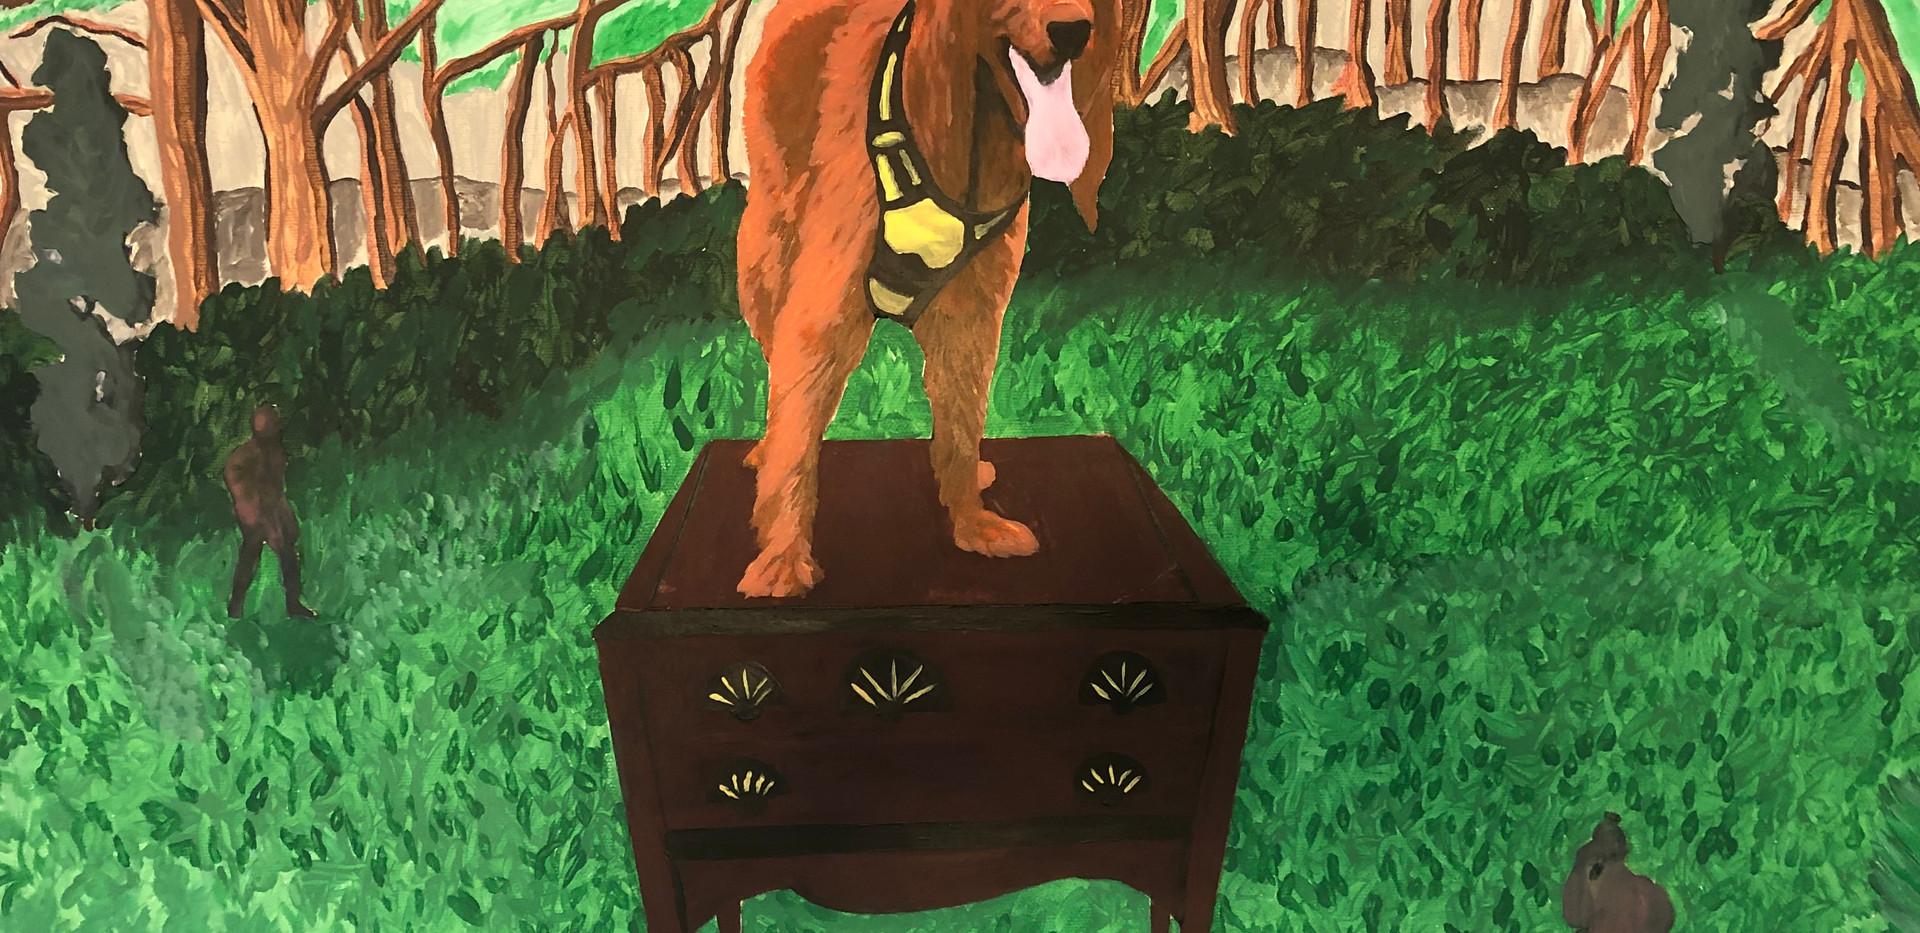 Emily Mullan_02_A Giant Dog.jpg